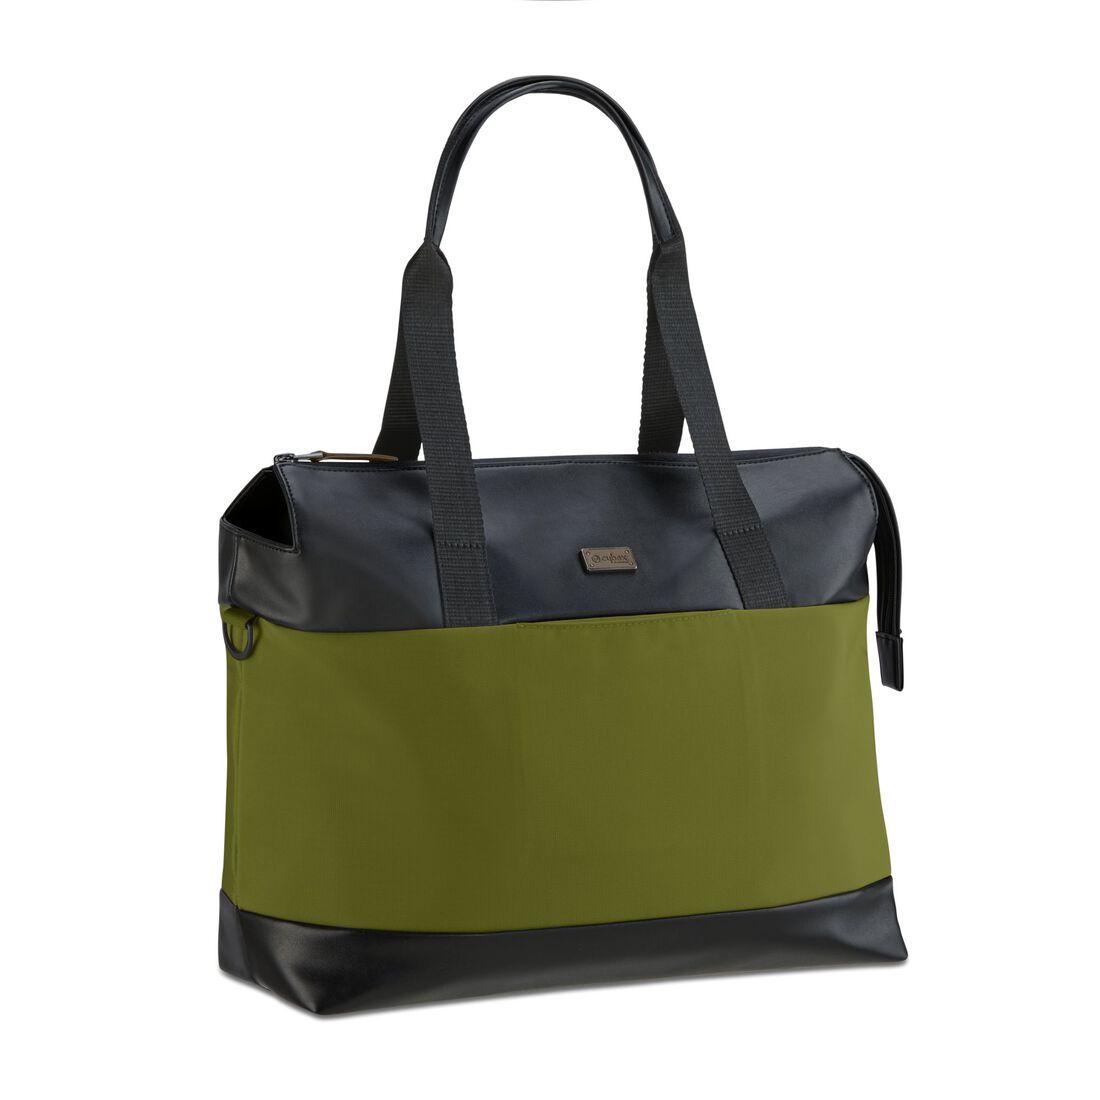 CYBEX Mios Changing Bag - Khaki Green in Khaki Green large image number 1